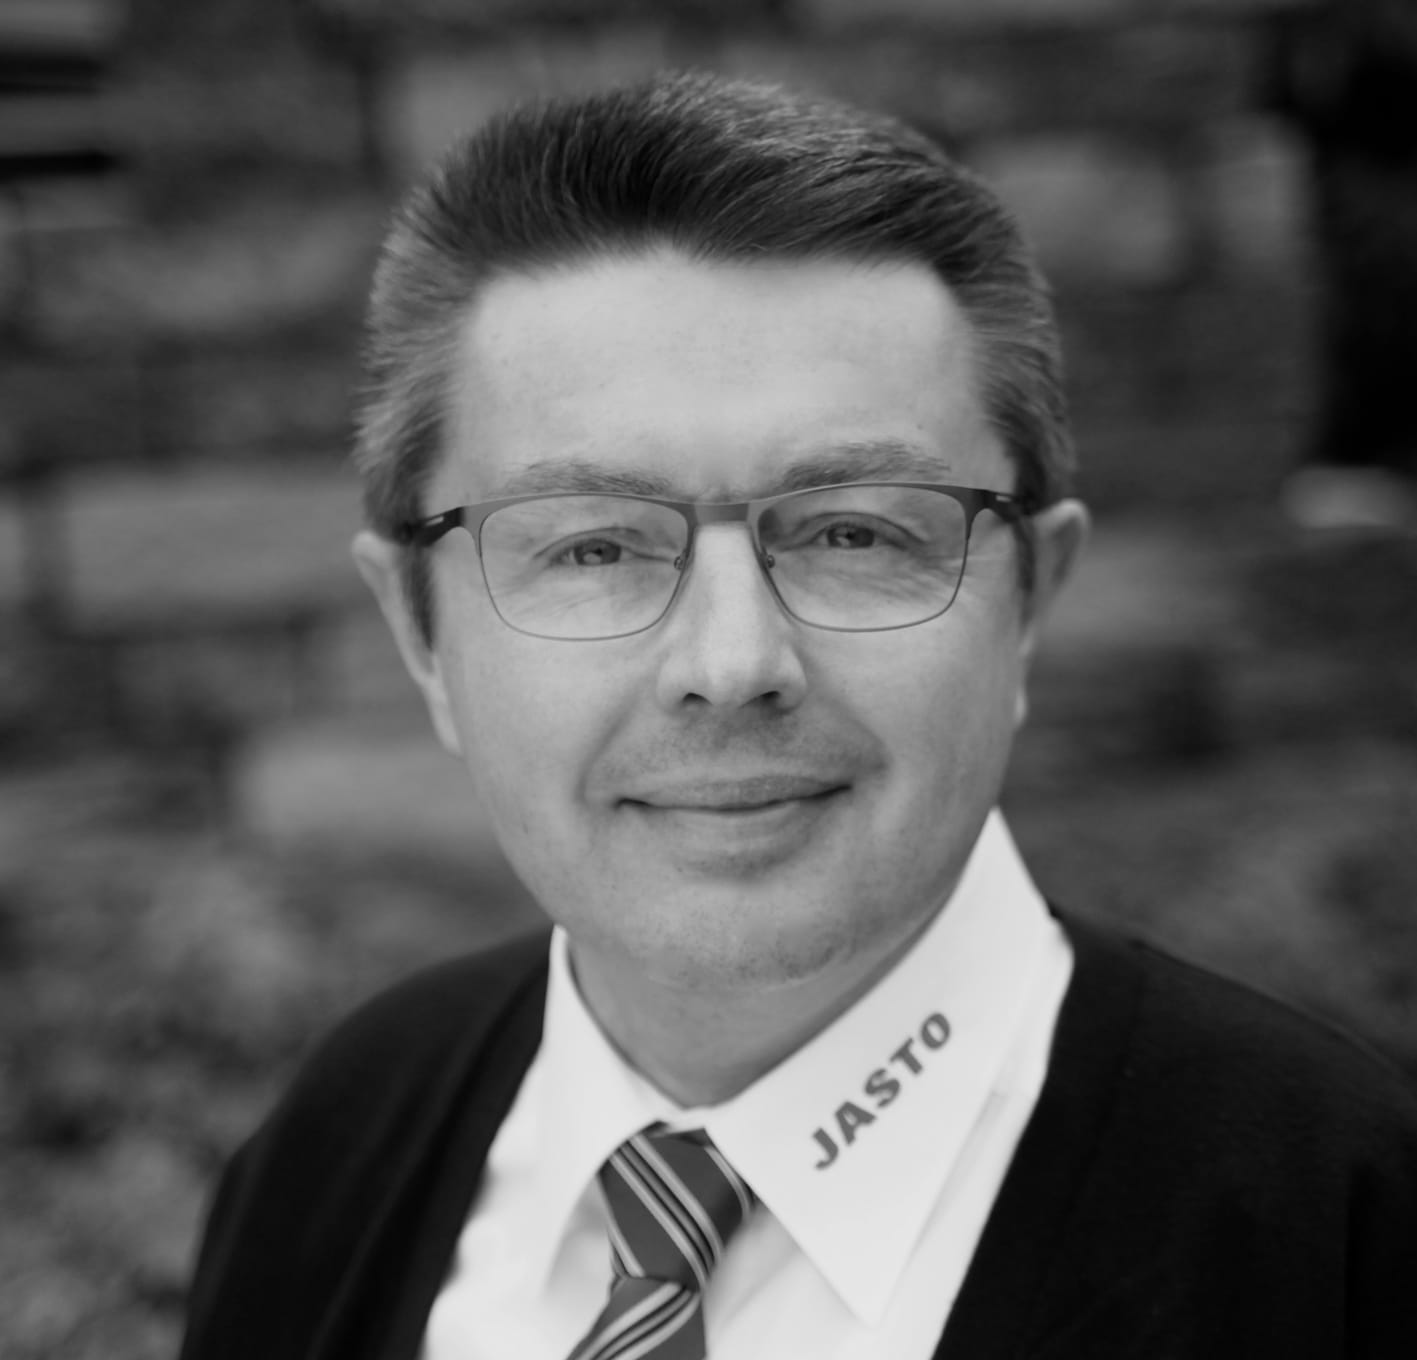 Dr. Johannes Schrenk